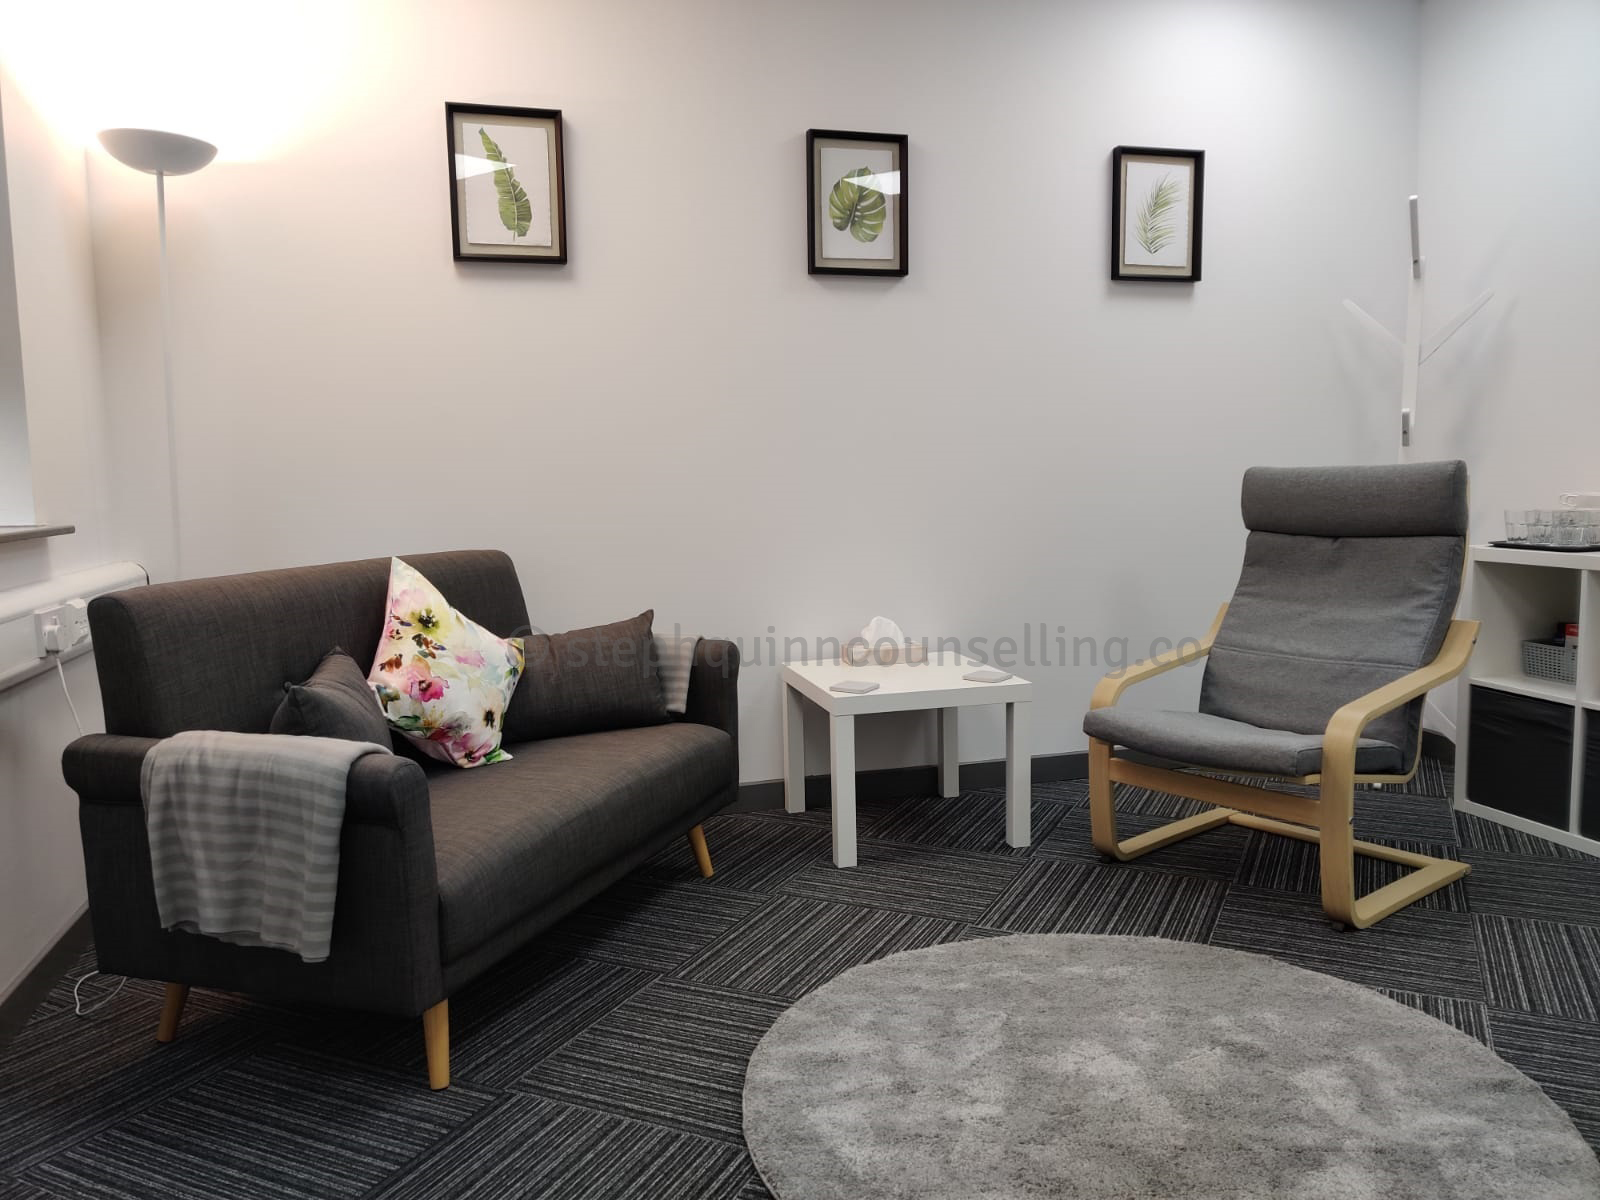 Steph Quinn Counselling room setup